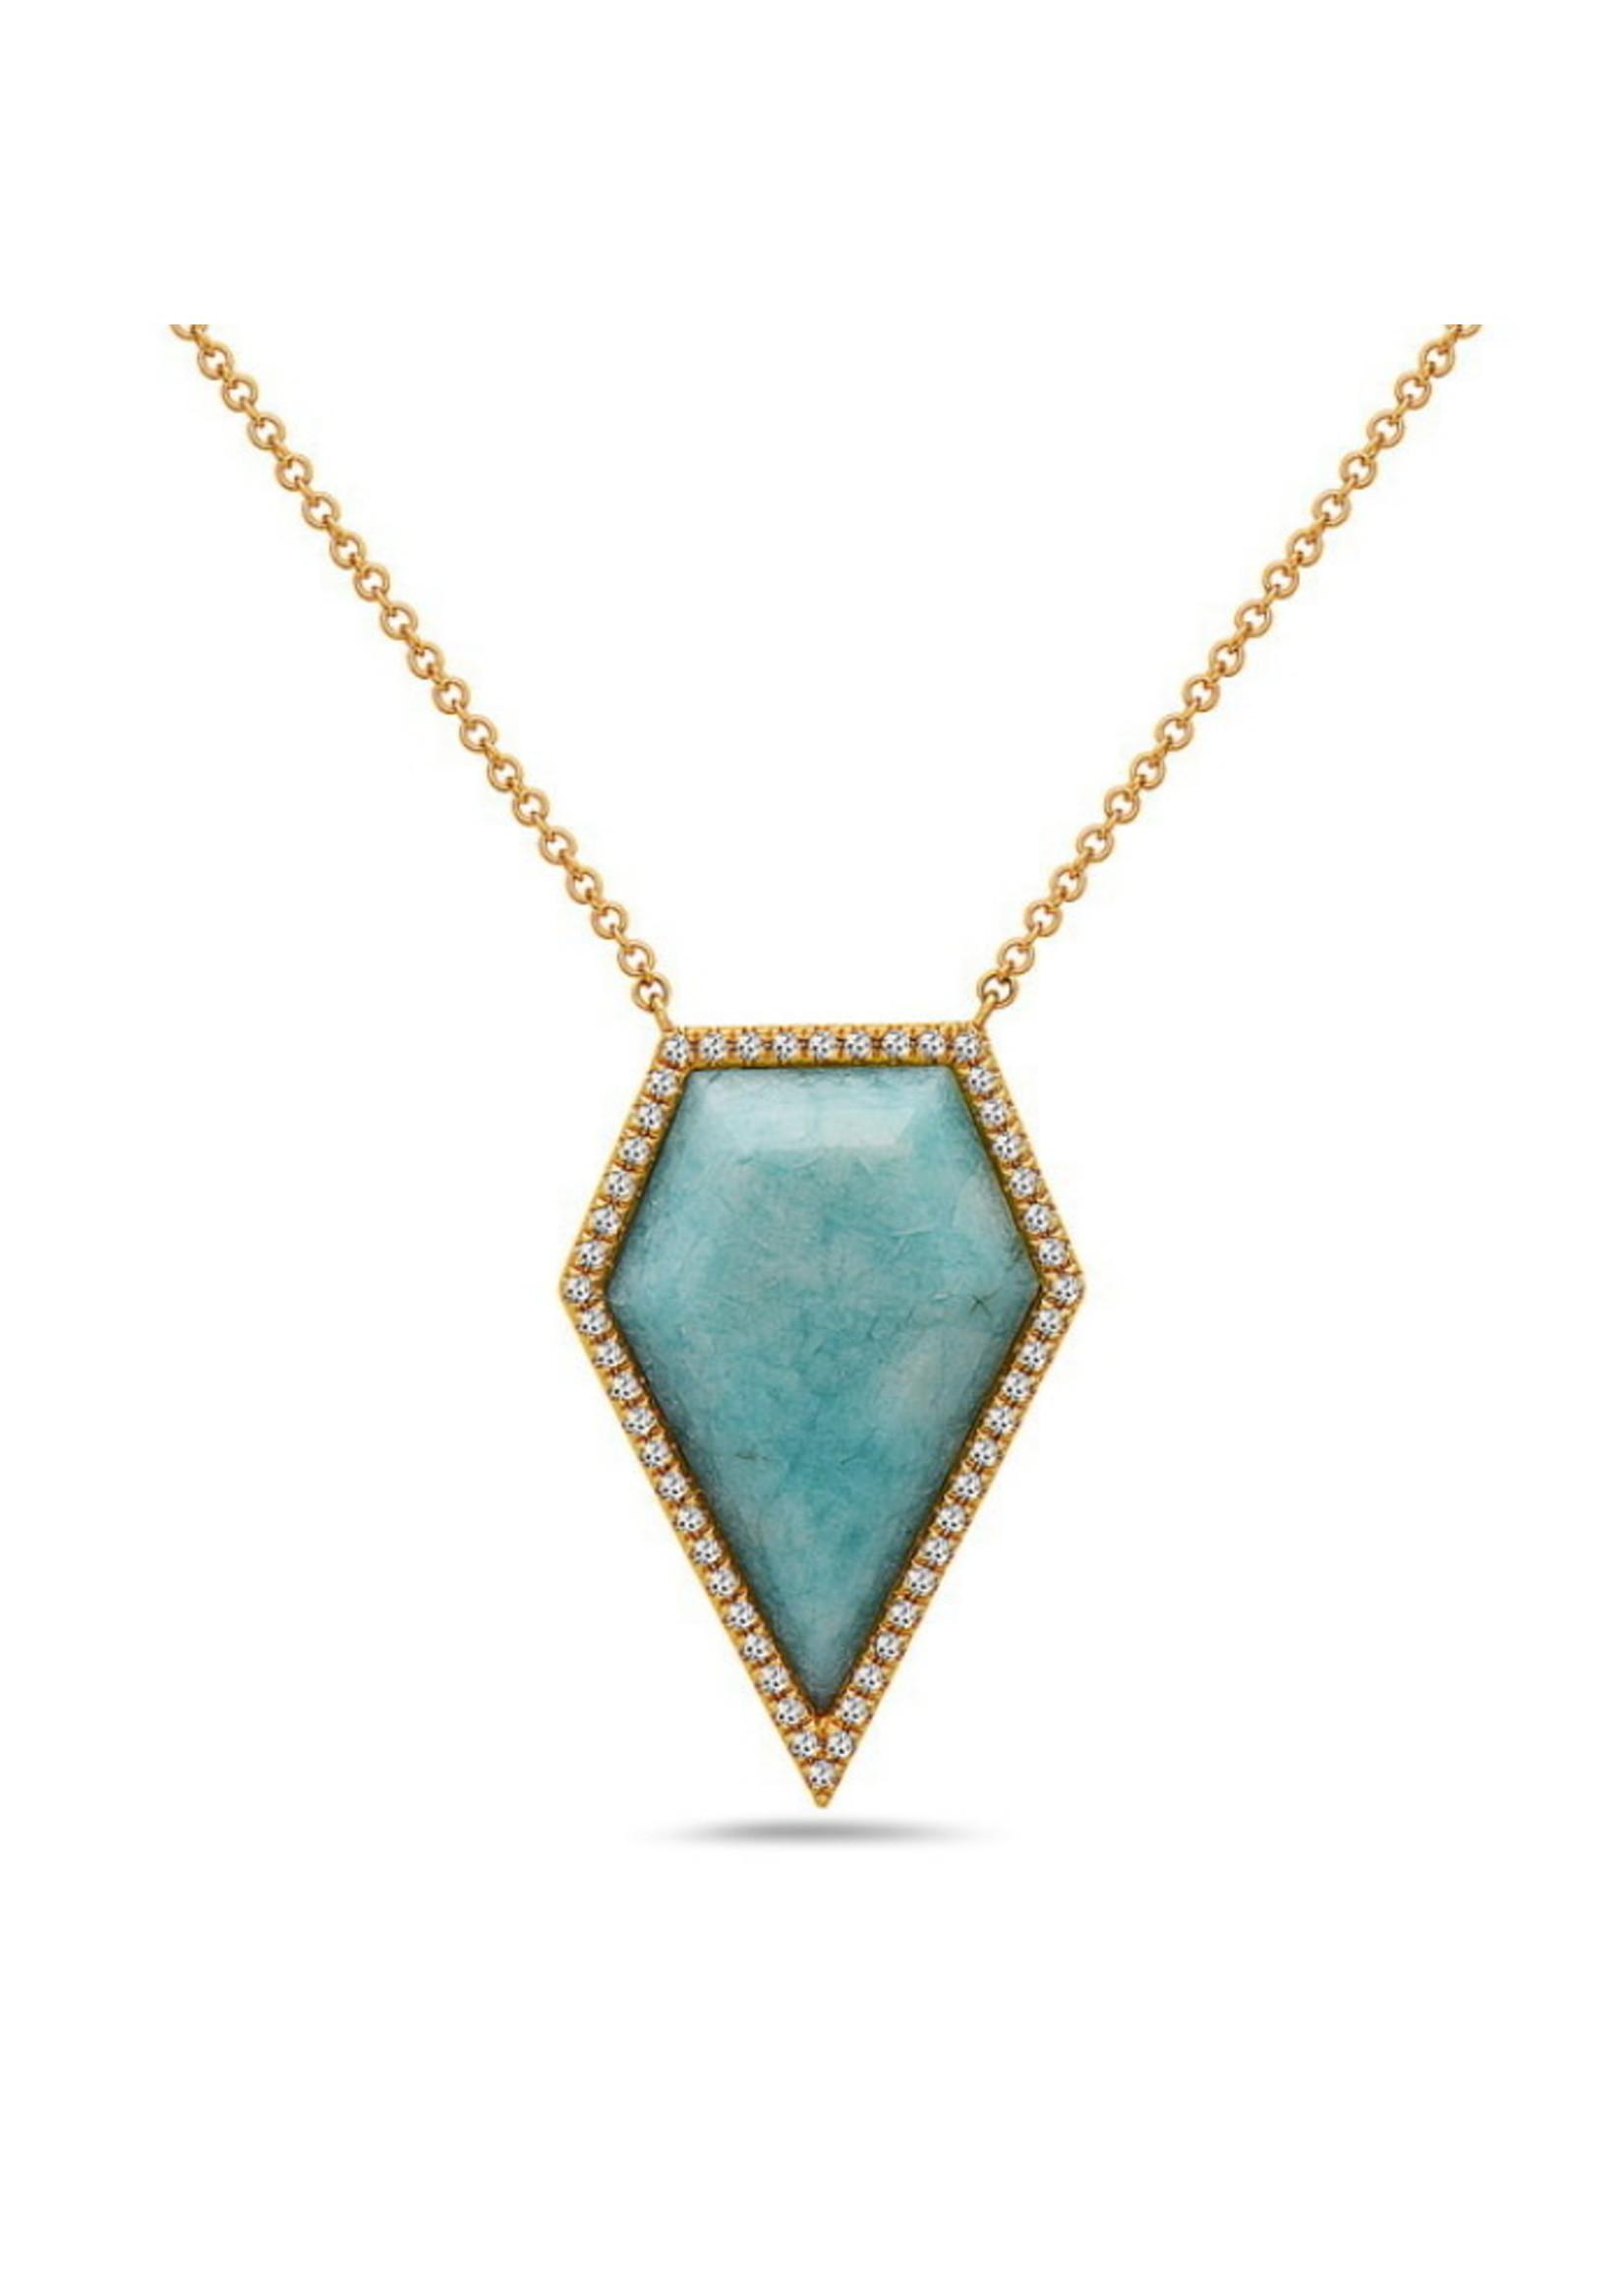 Jill Alberts Geometric Amazonite Pendant with Diamonds Necklace